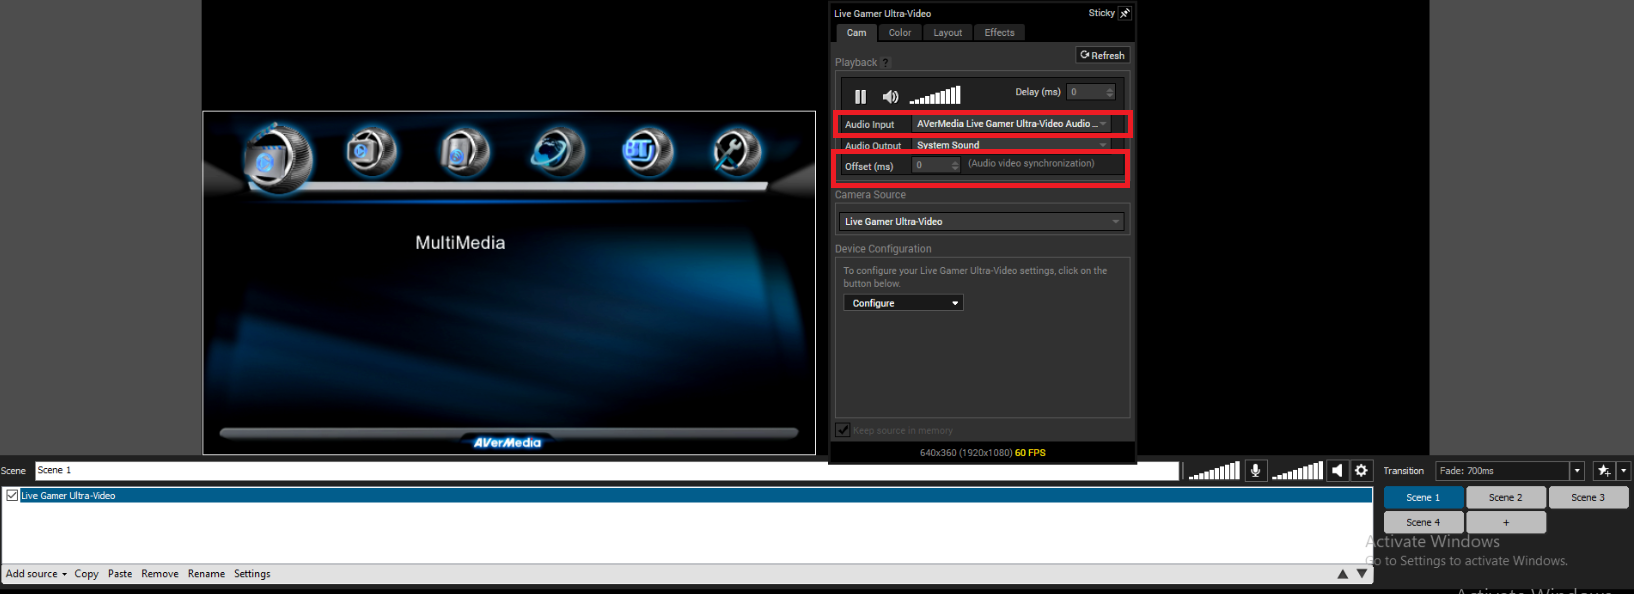 live gamer ultra firmware version 1.3.6.2